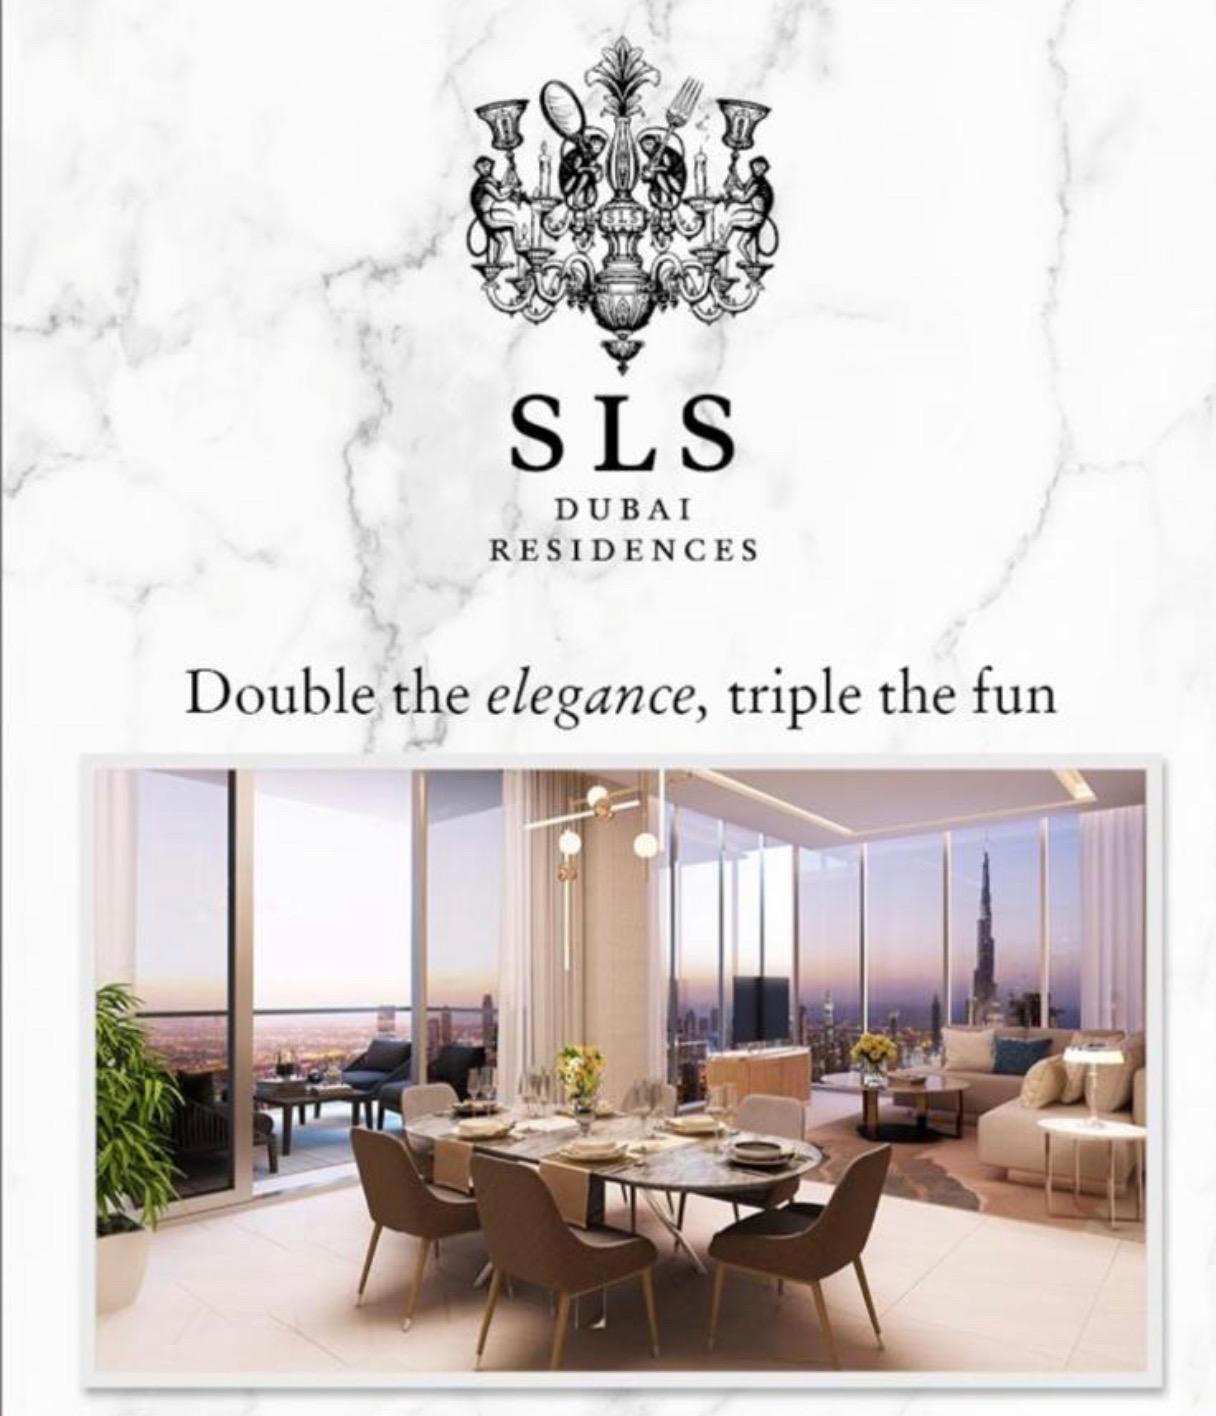 Large Studio Apartment in High Luxury SLS Dubai Residences